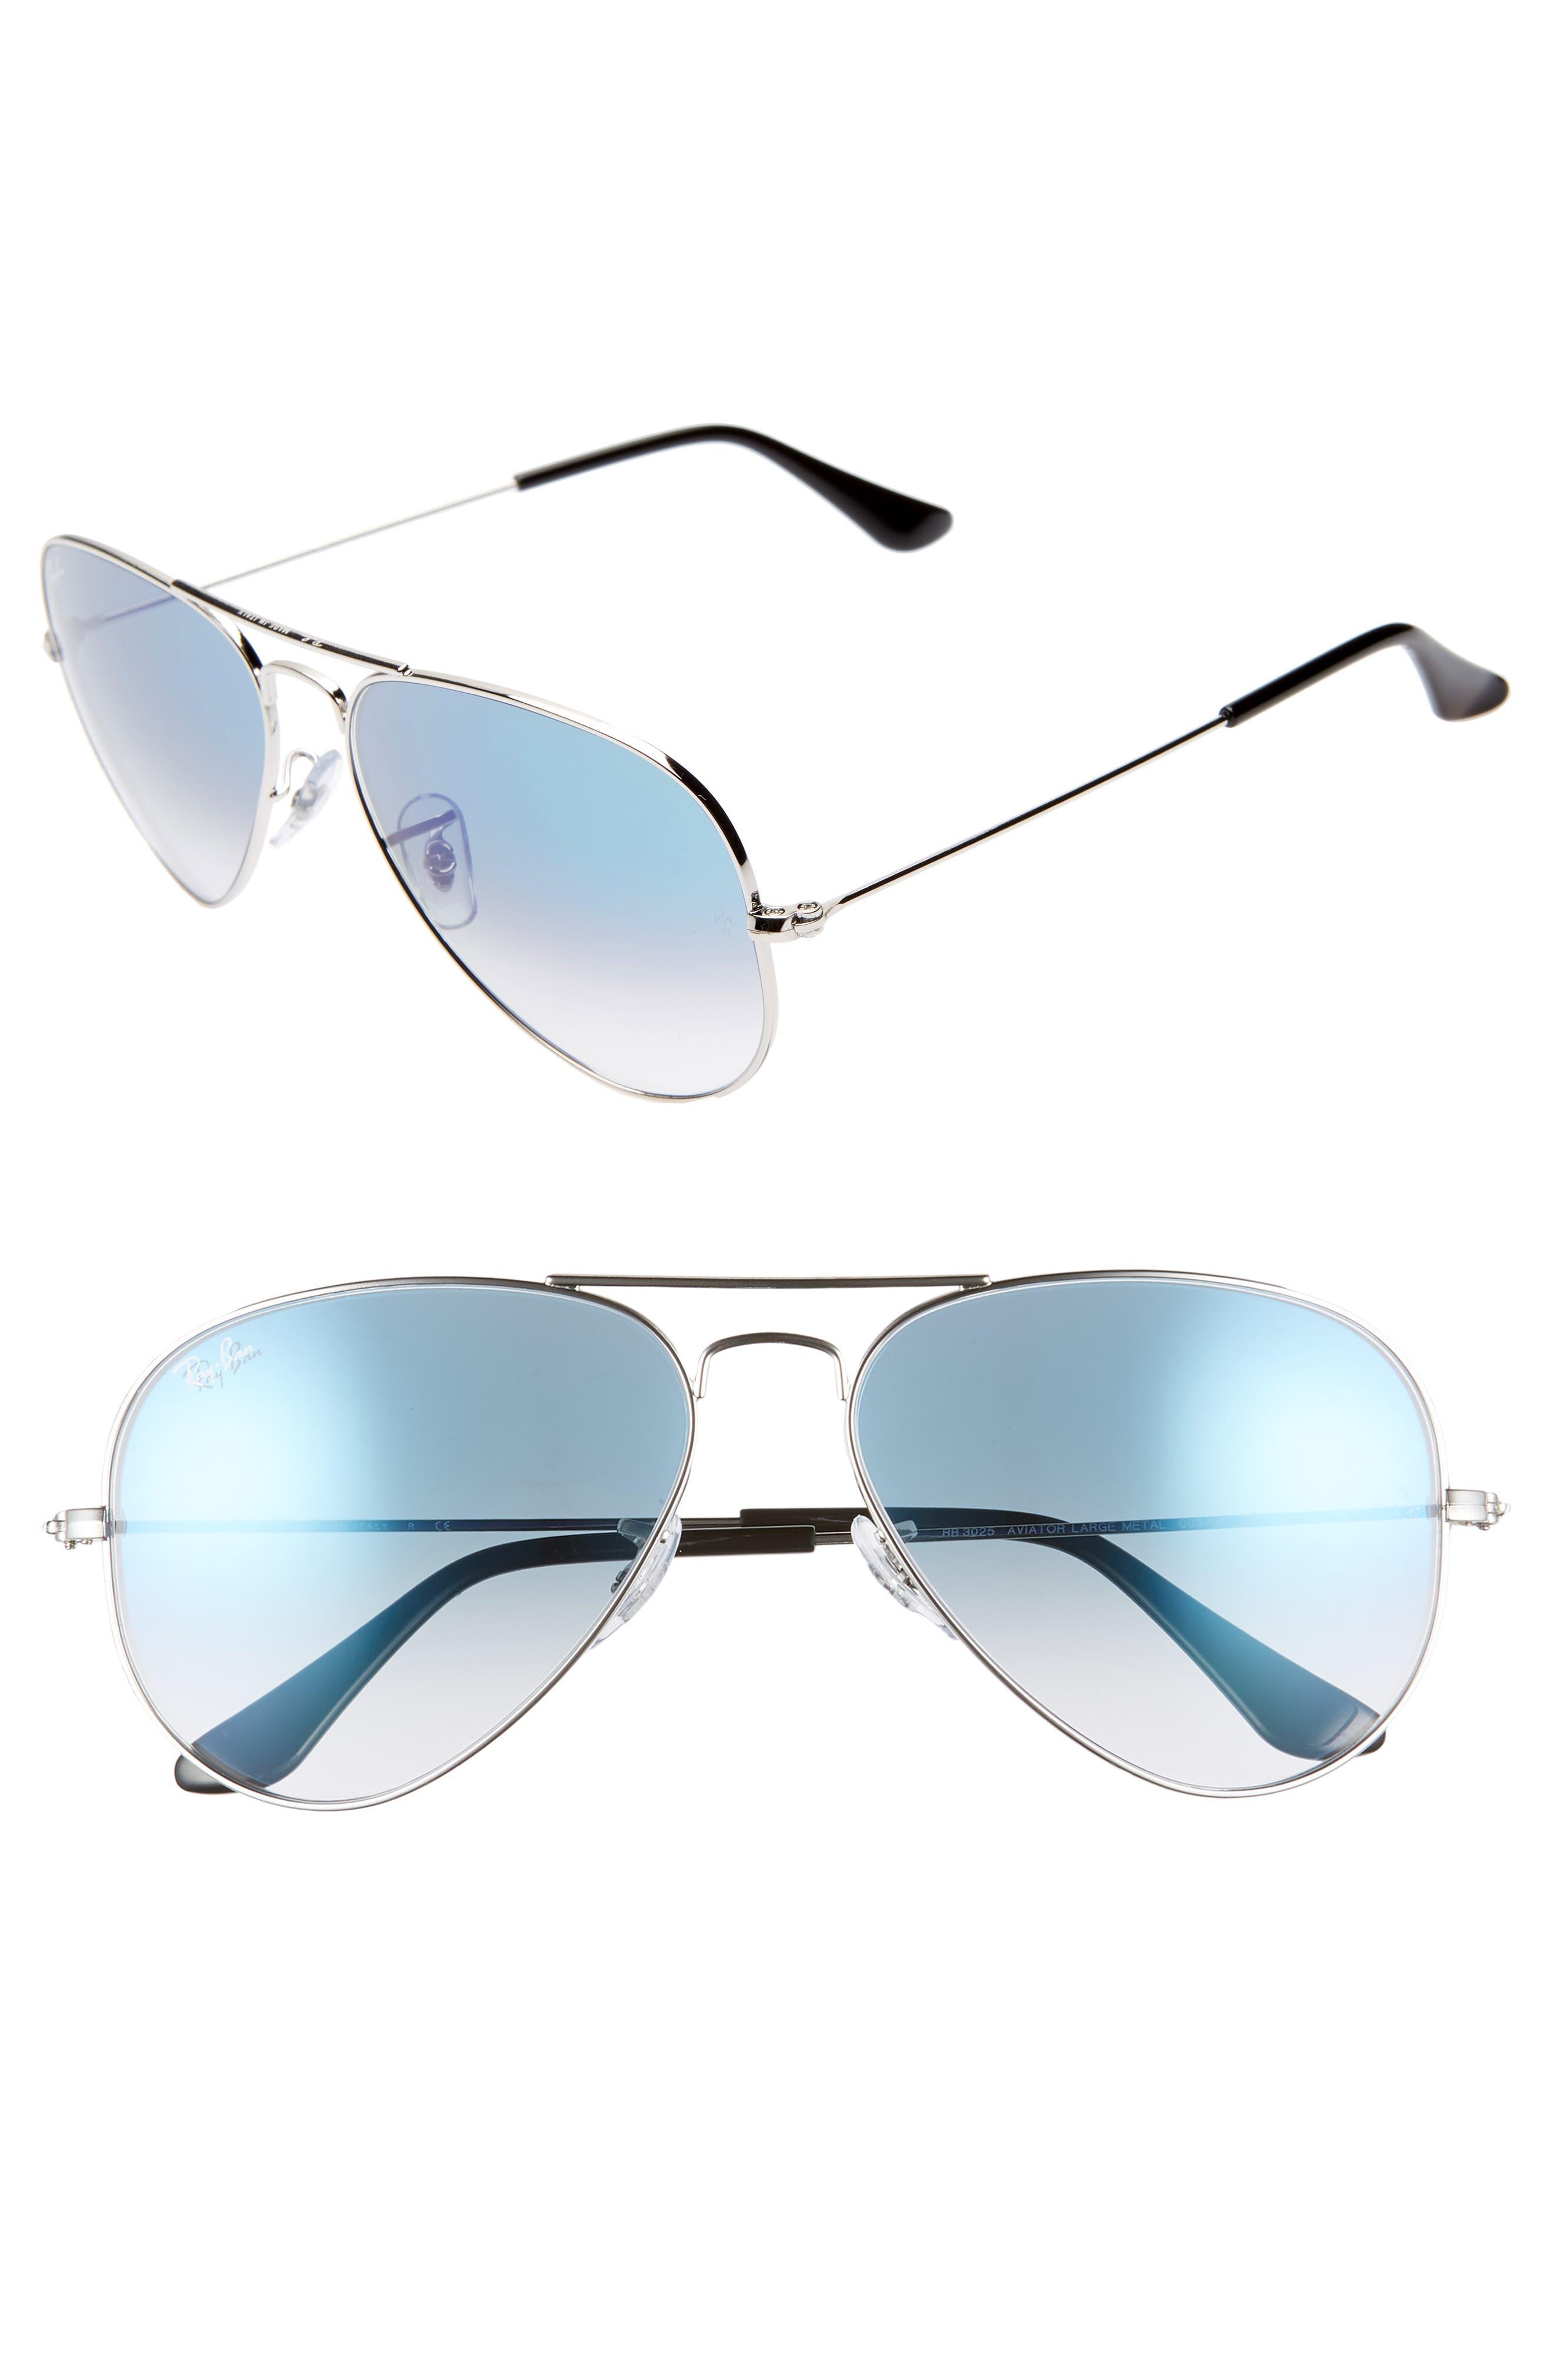 RAY-BAN, 58mm Gradient Aviator Sunglasses, Main thumbnail 1, color, SILVER/ BLUE GRADIENT